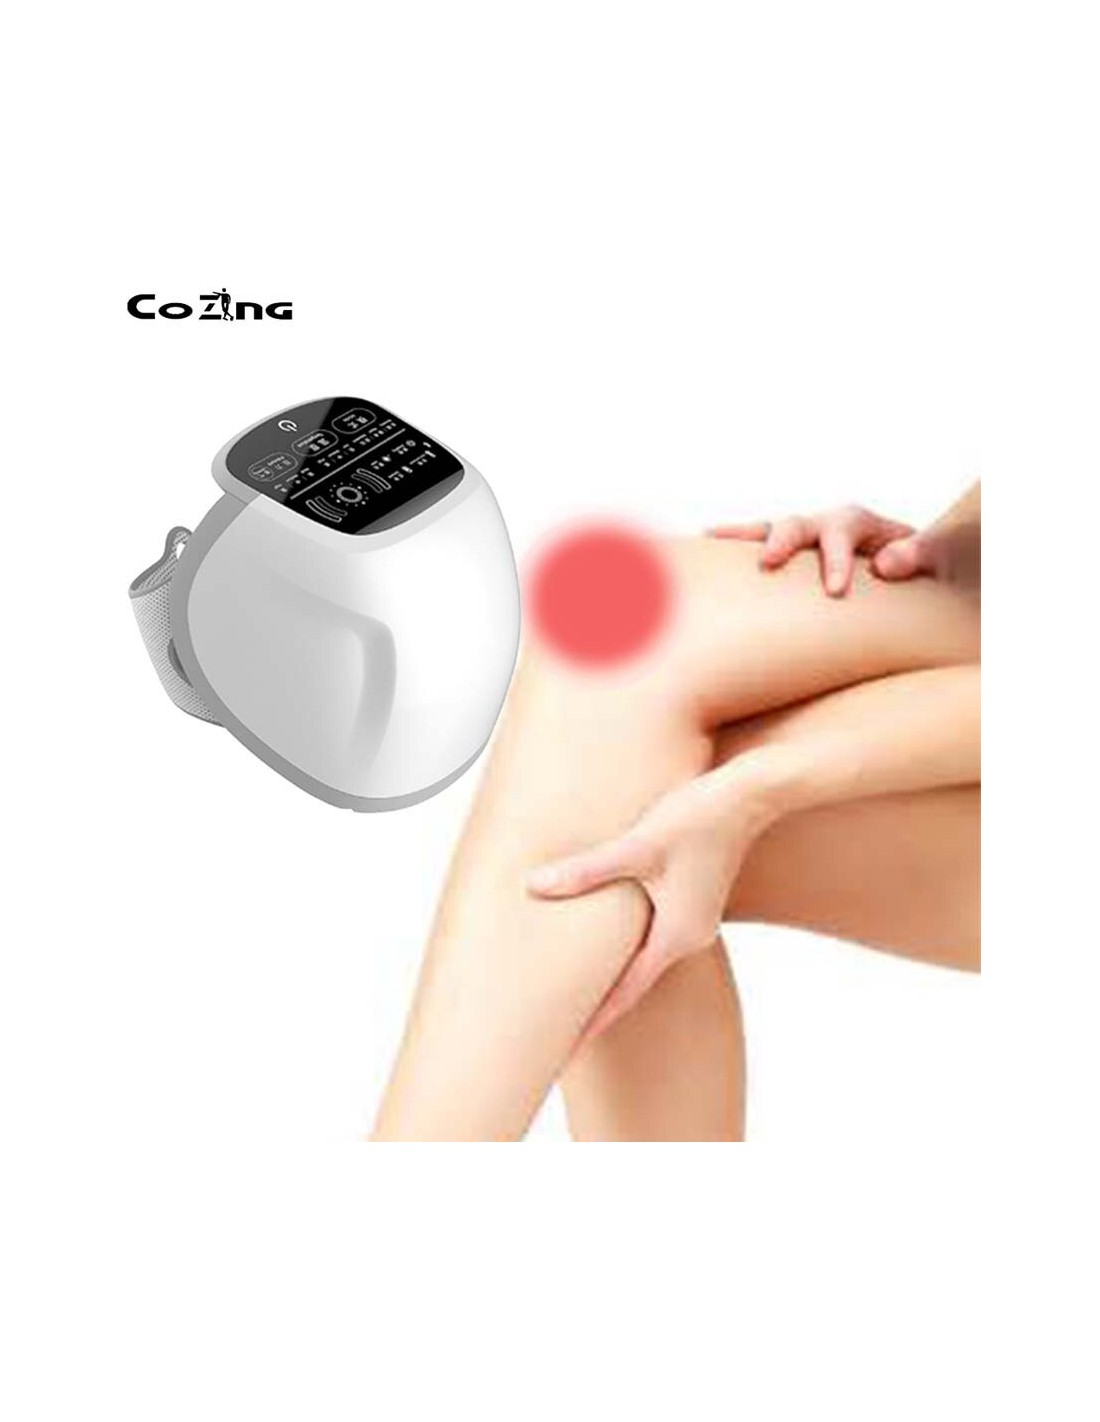 Fara dureri de genunchi | Noutati | Ozonoterapie Timisoara | Clinica Medozon